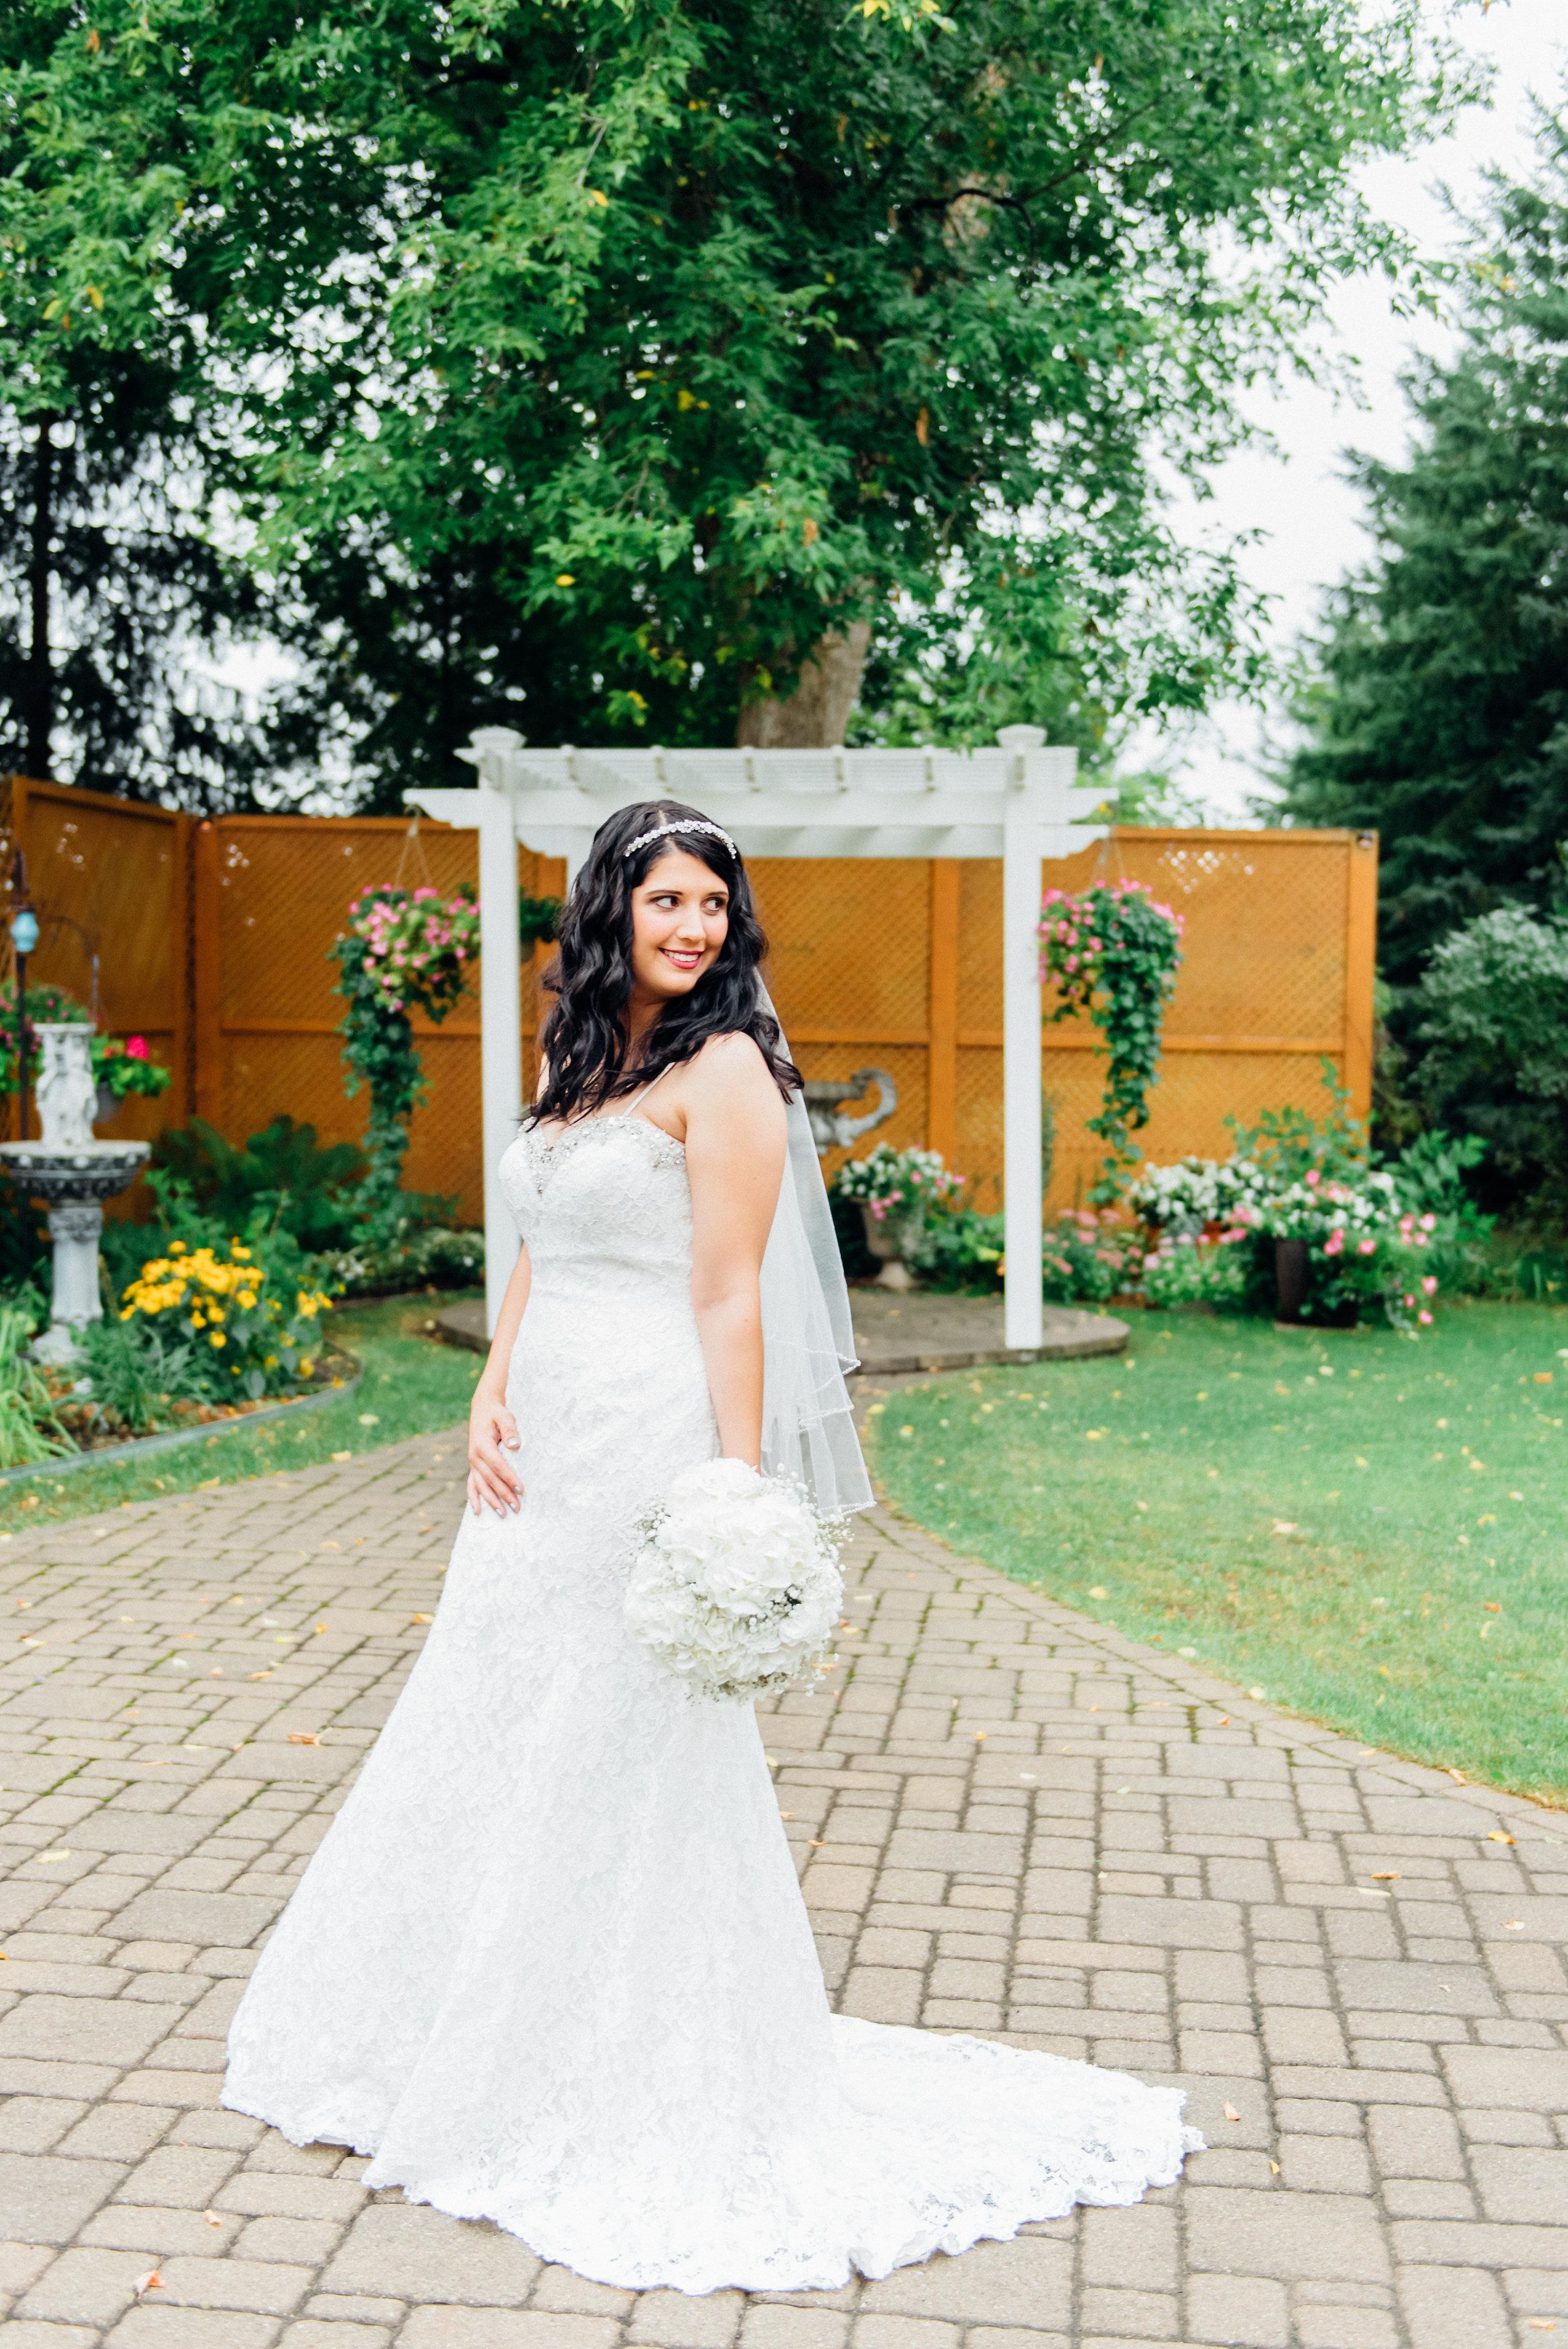 Jocelyn+SteveWedding-AliandBatoulPhotography_-172.jpg